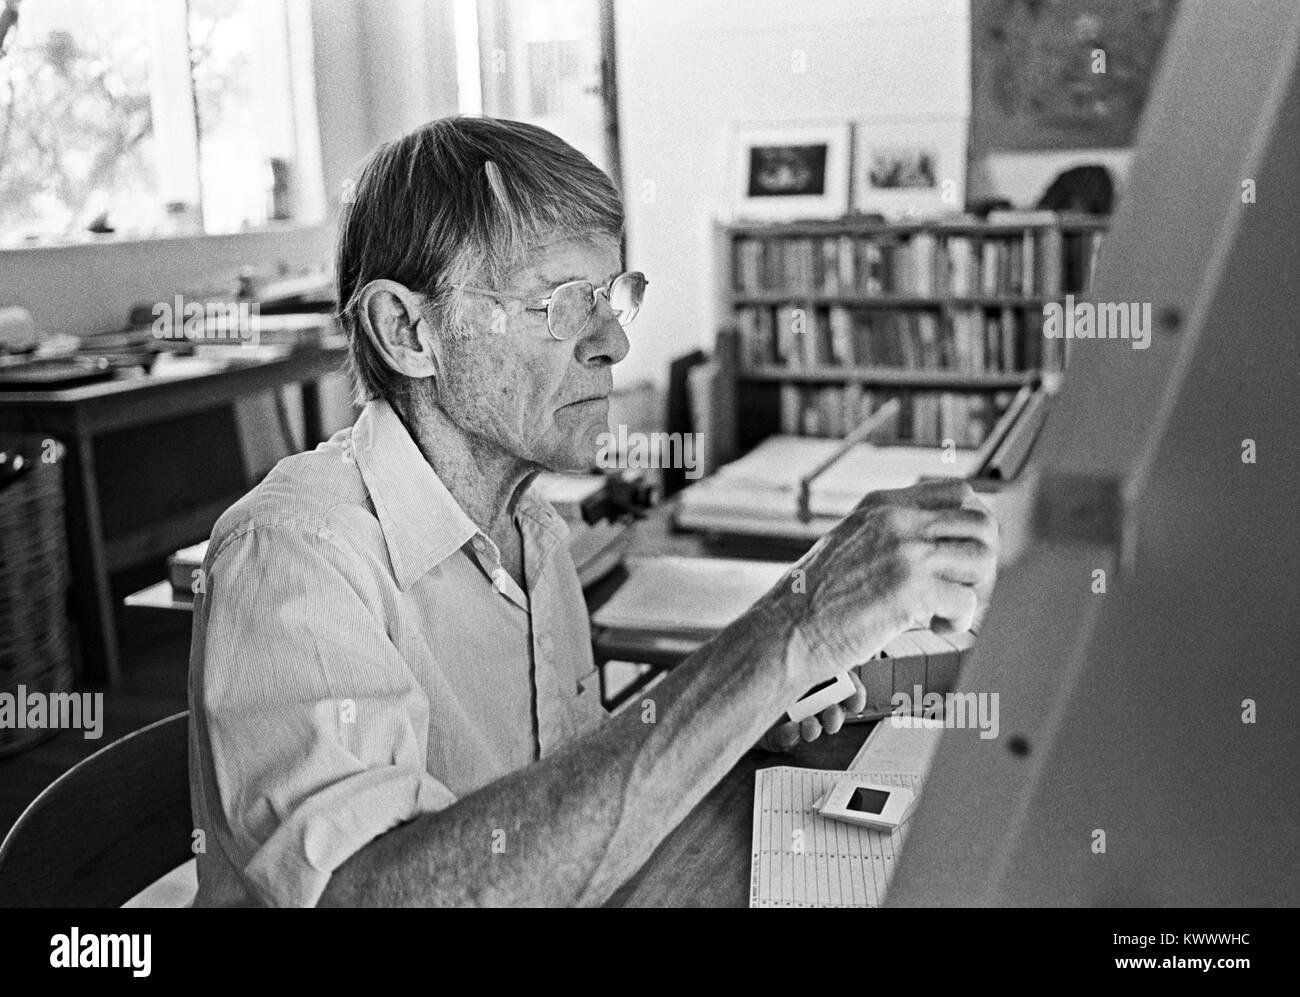 A portrait of American photographer Eliot Porter, in his studio in Tesuque, New Mexico, circa 1979. - Stock Image